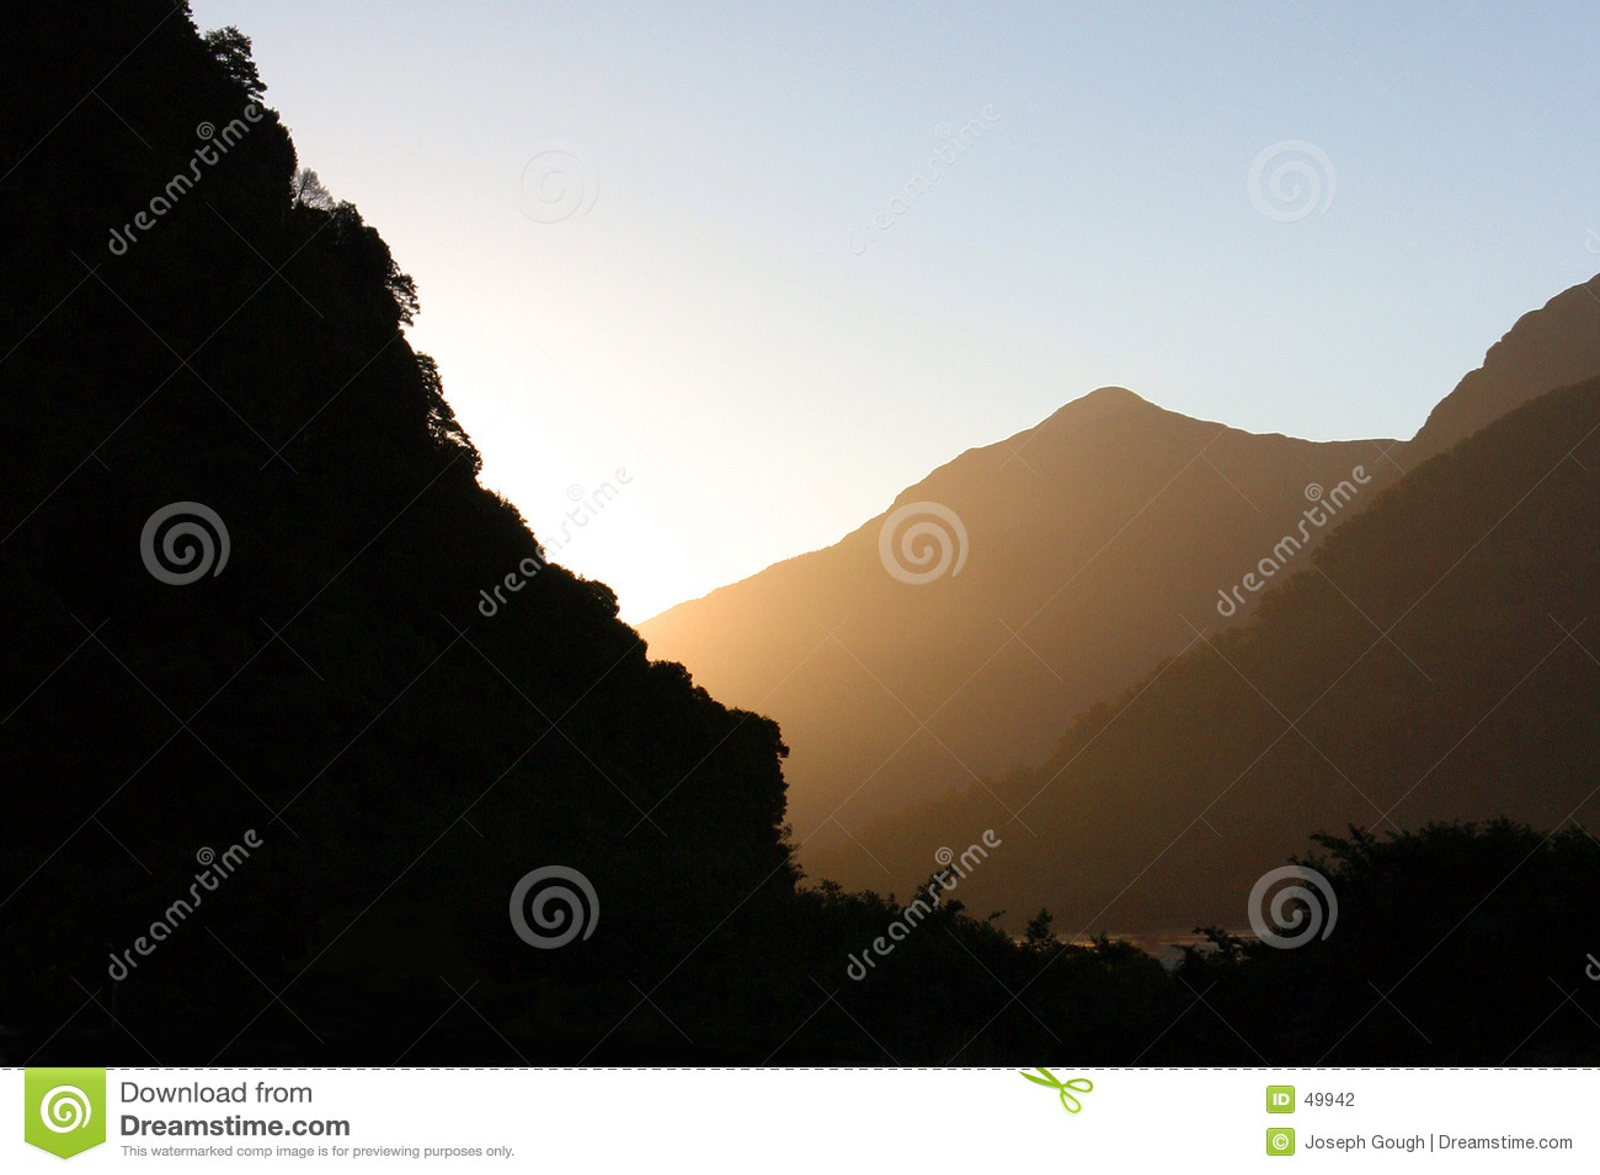 Góry abstrakcyjnych